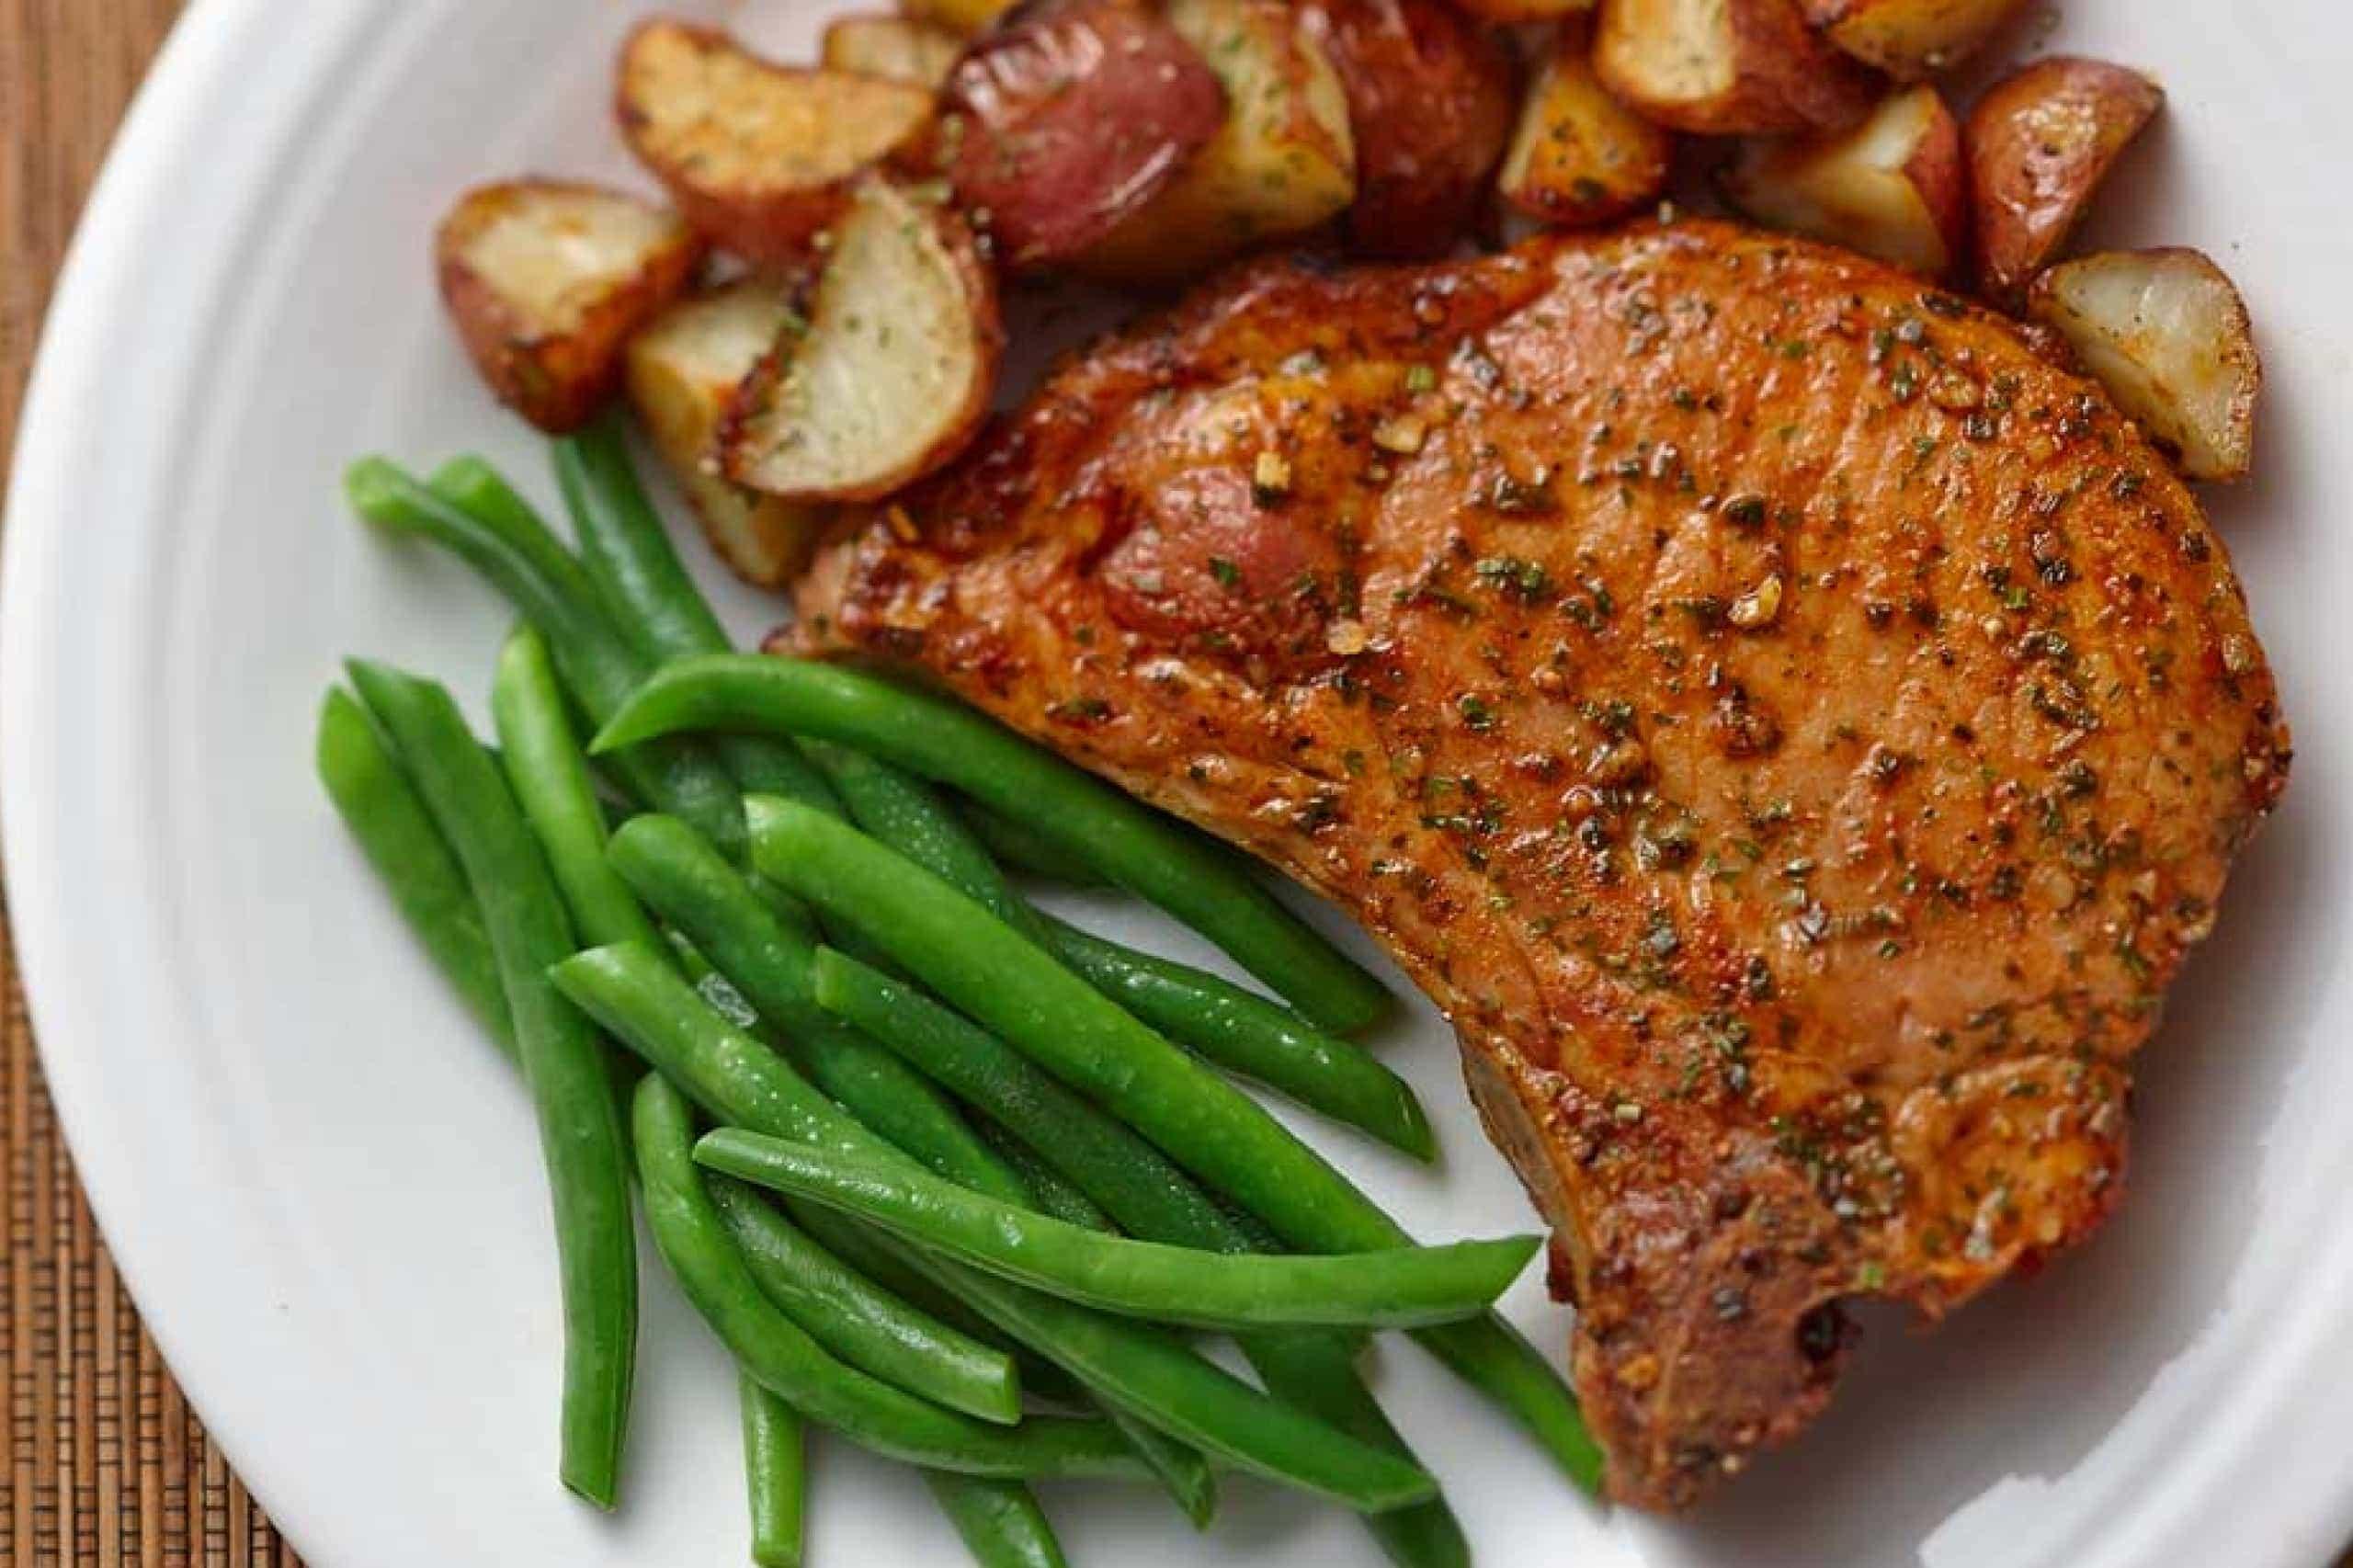 pork chop recipe hidden valley ranch Original Ranch® Pork Chops